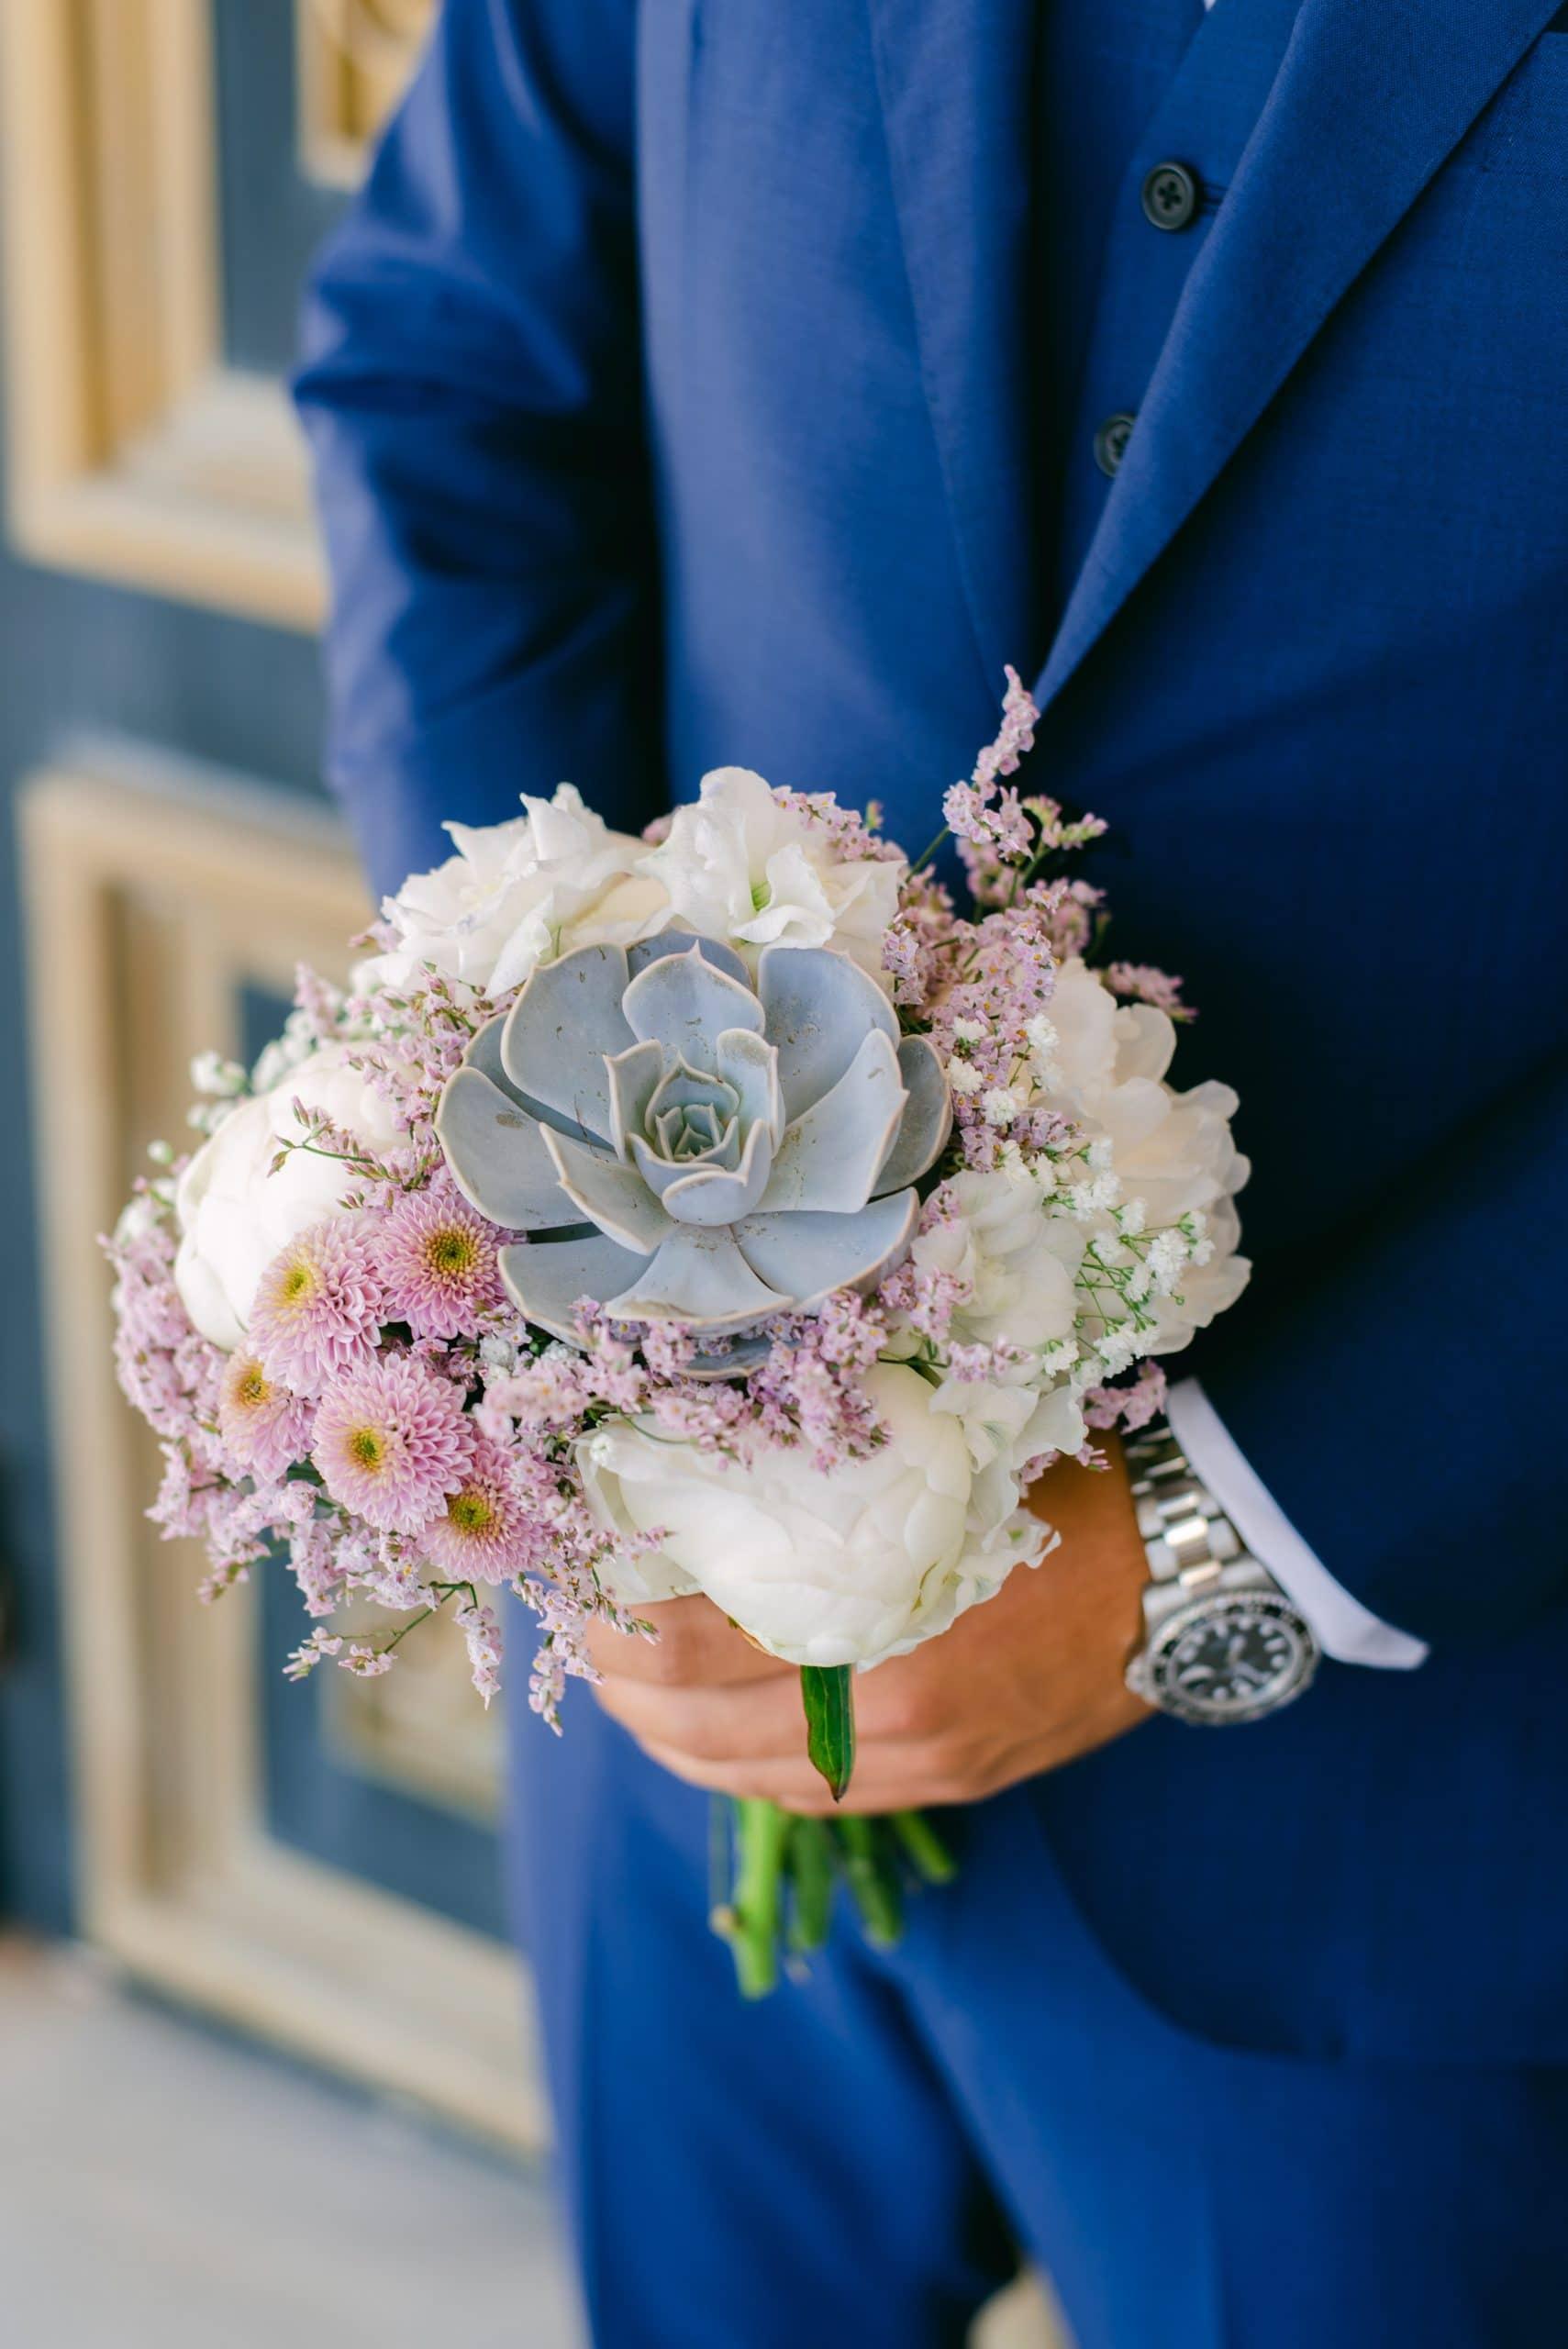 Nυφική ανθοδέσμη με παχύφυτα και άλλα άνθη